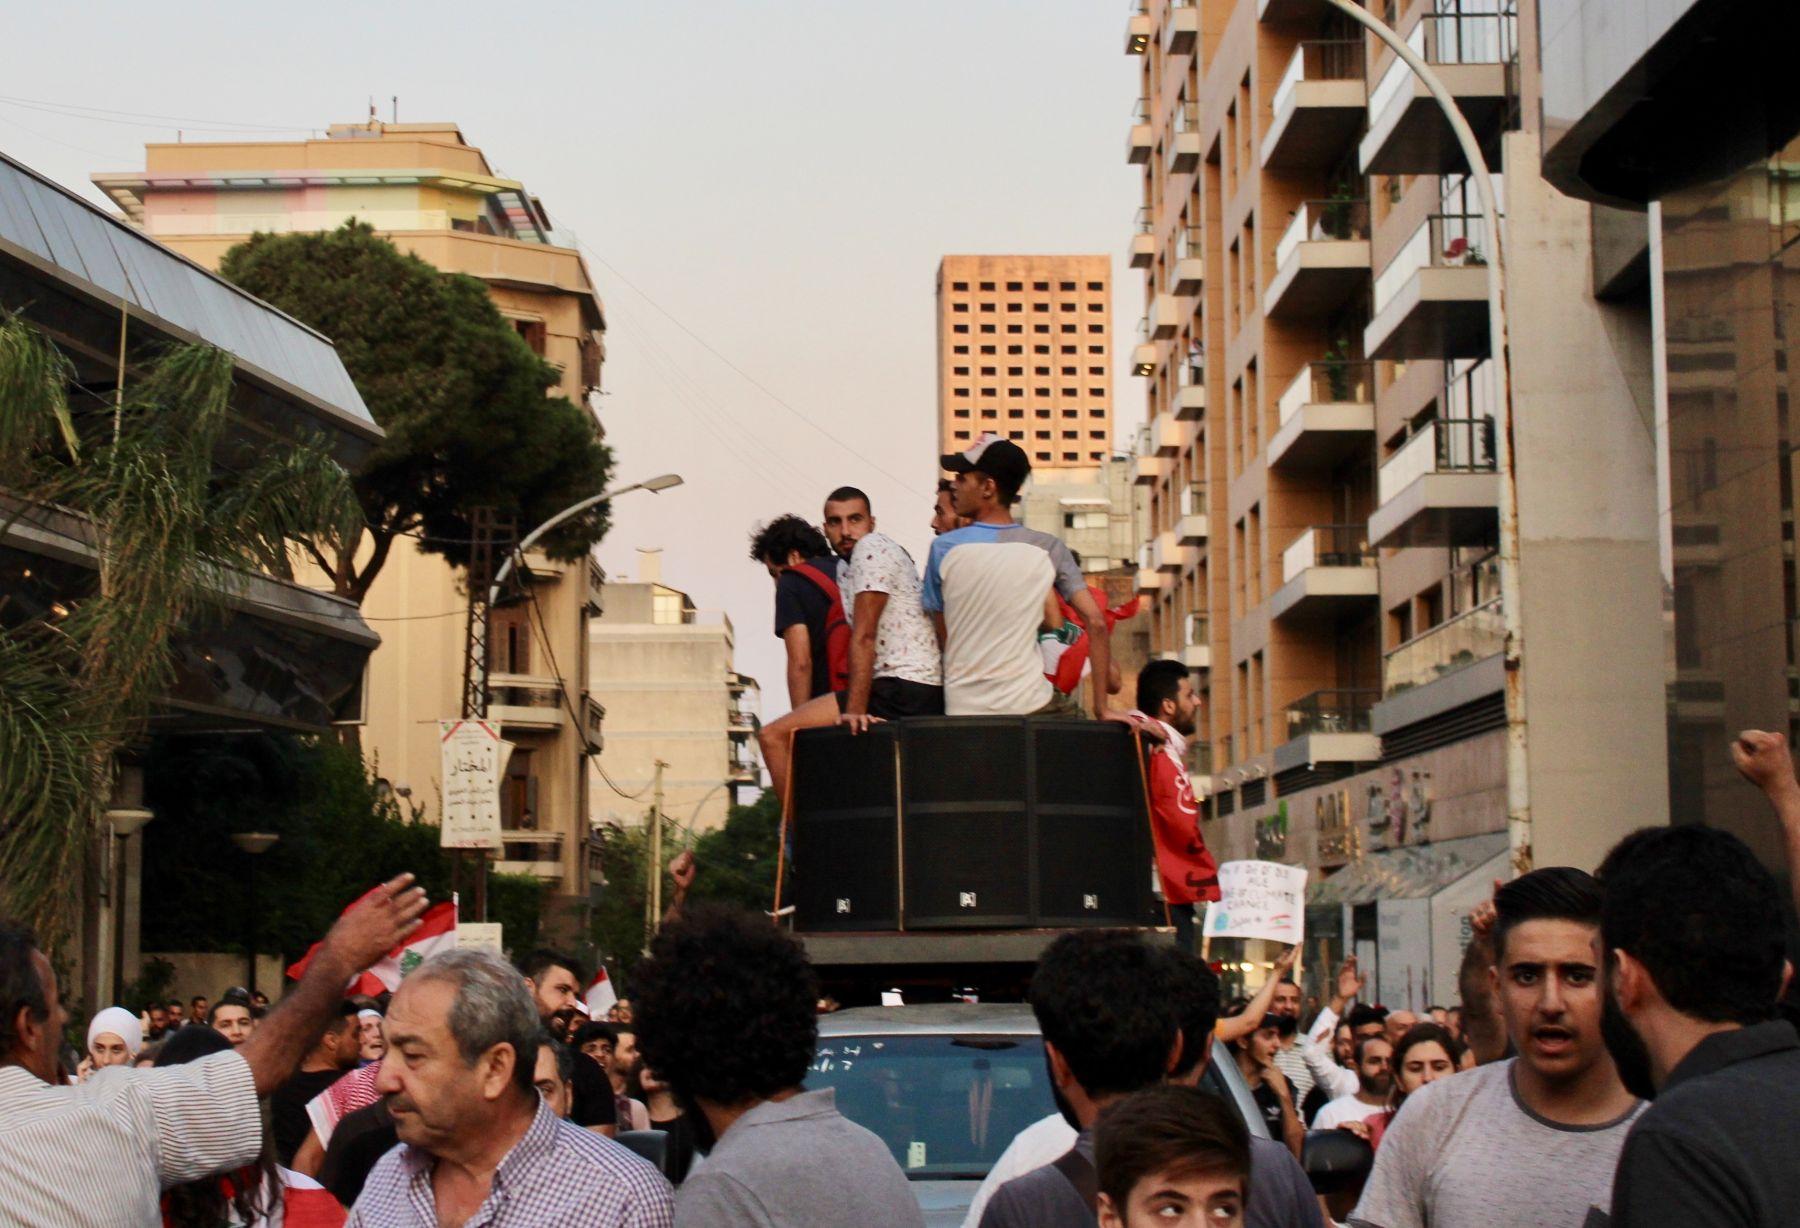 Contestation of divisive politics in Lebanon and Bosnia: Comparative thoughts